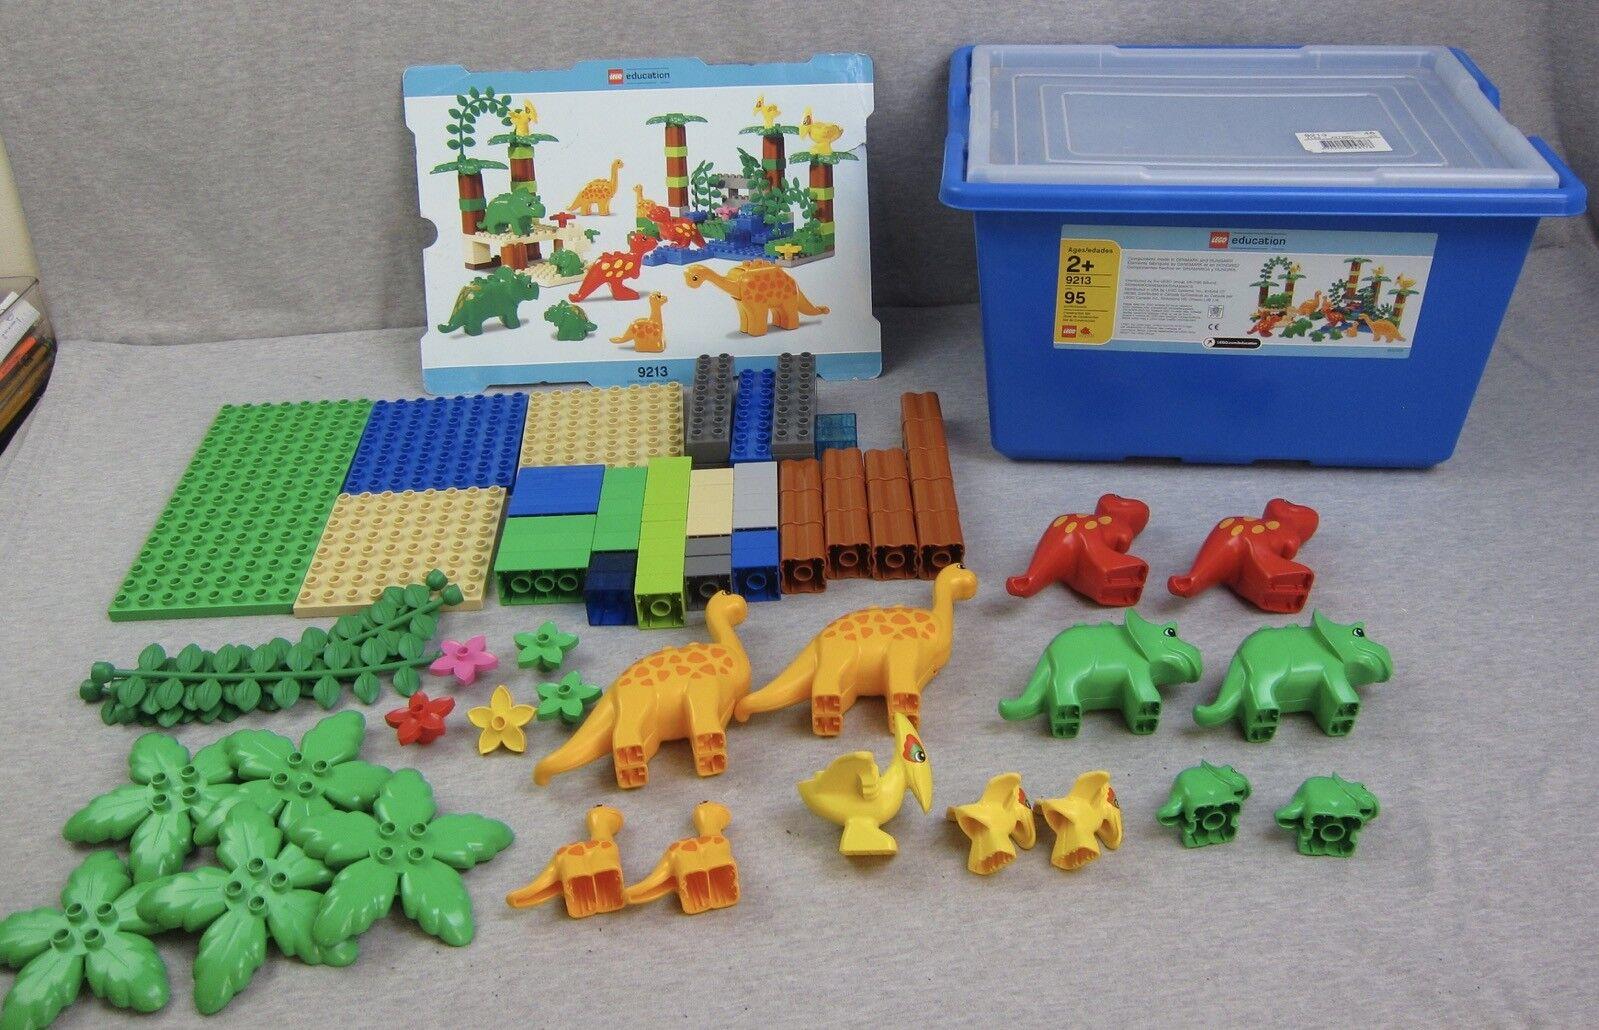 Lego Duplo 9213 Juego De Educación dinosaurios 2007 Dinosaurio Completa Brontosaurio Trex